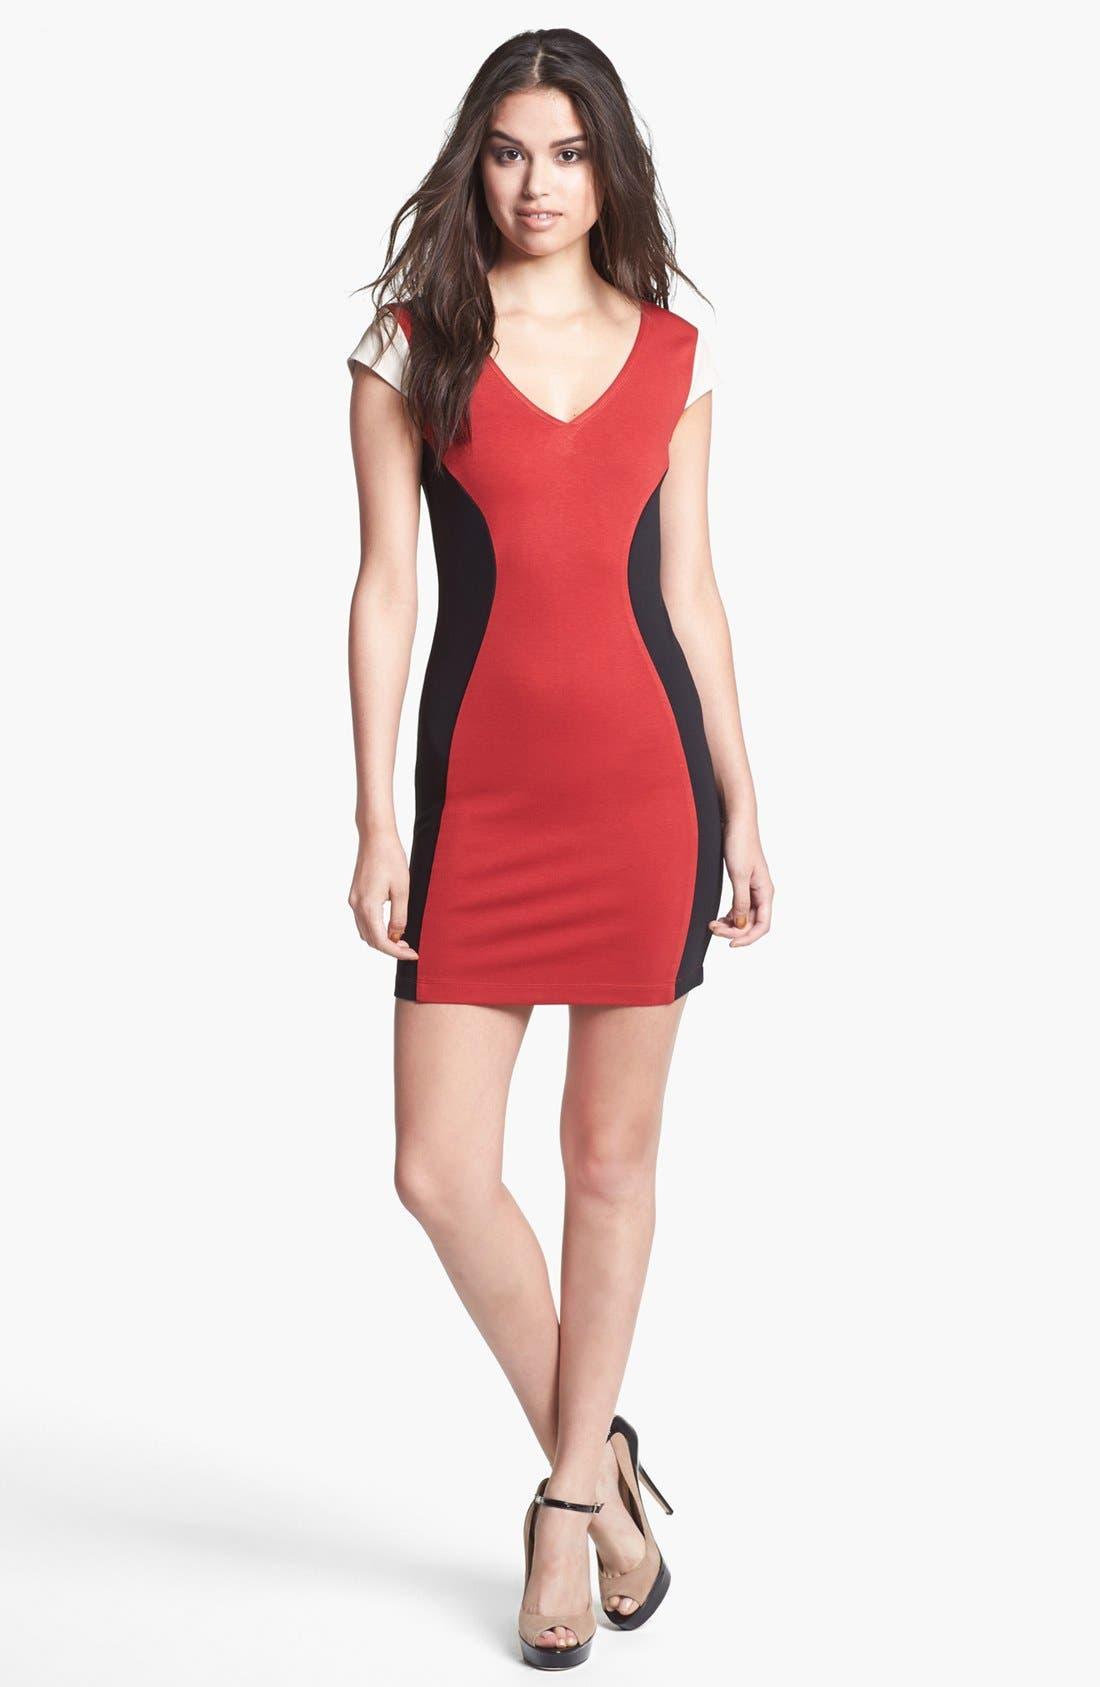 Main Image - Madison Marcus Faux Leather Sleeve Colorblock Sheath Dress